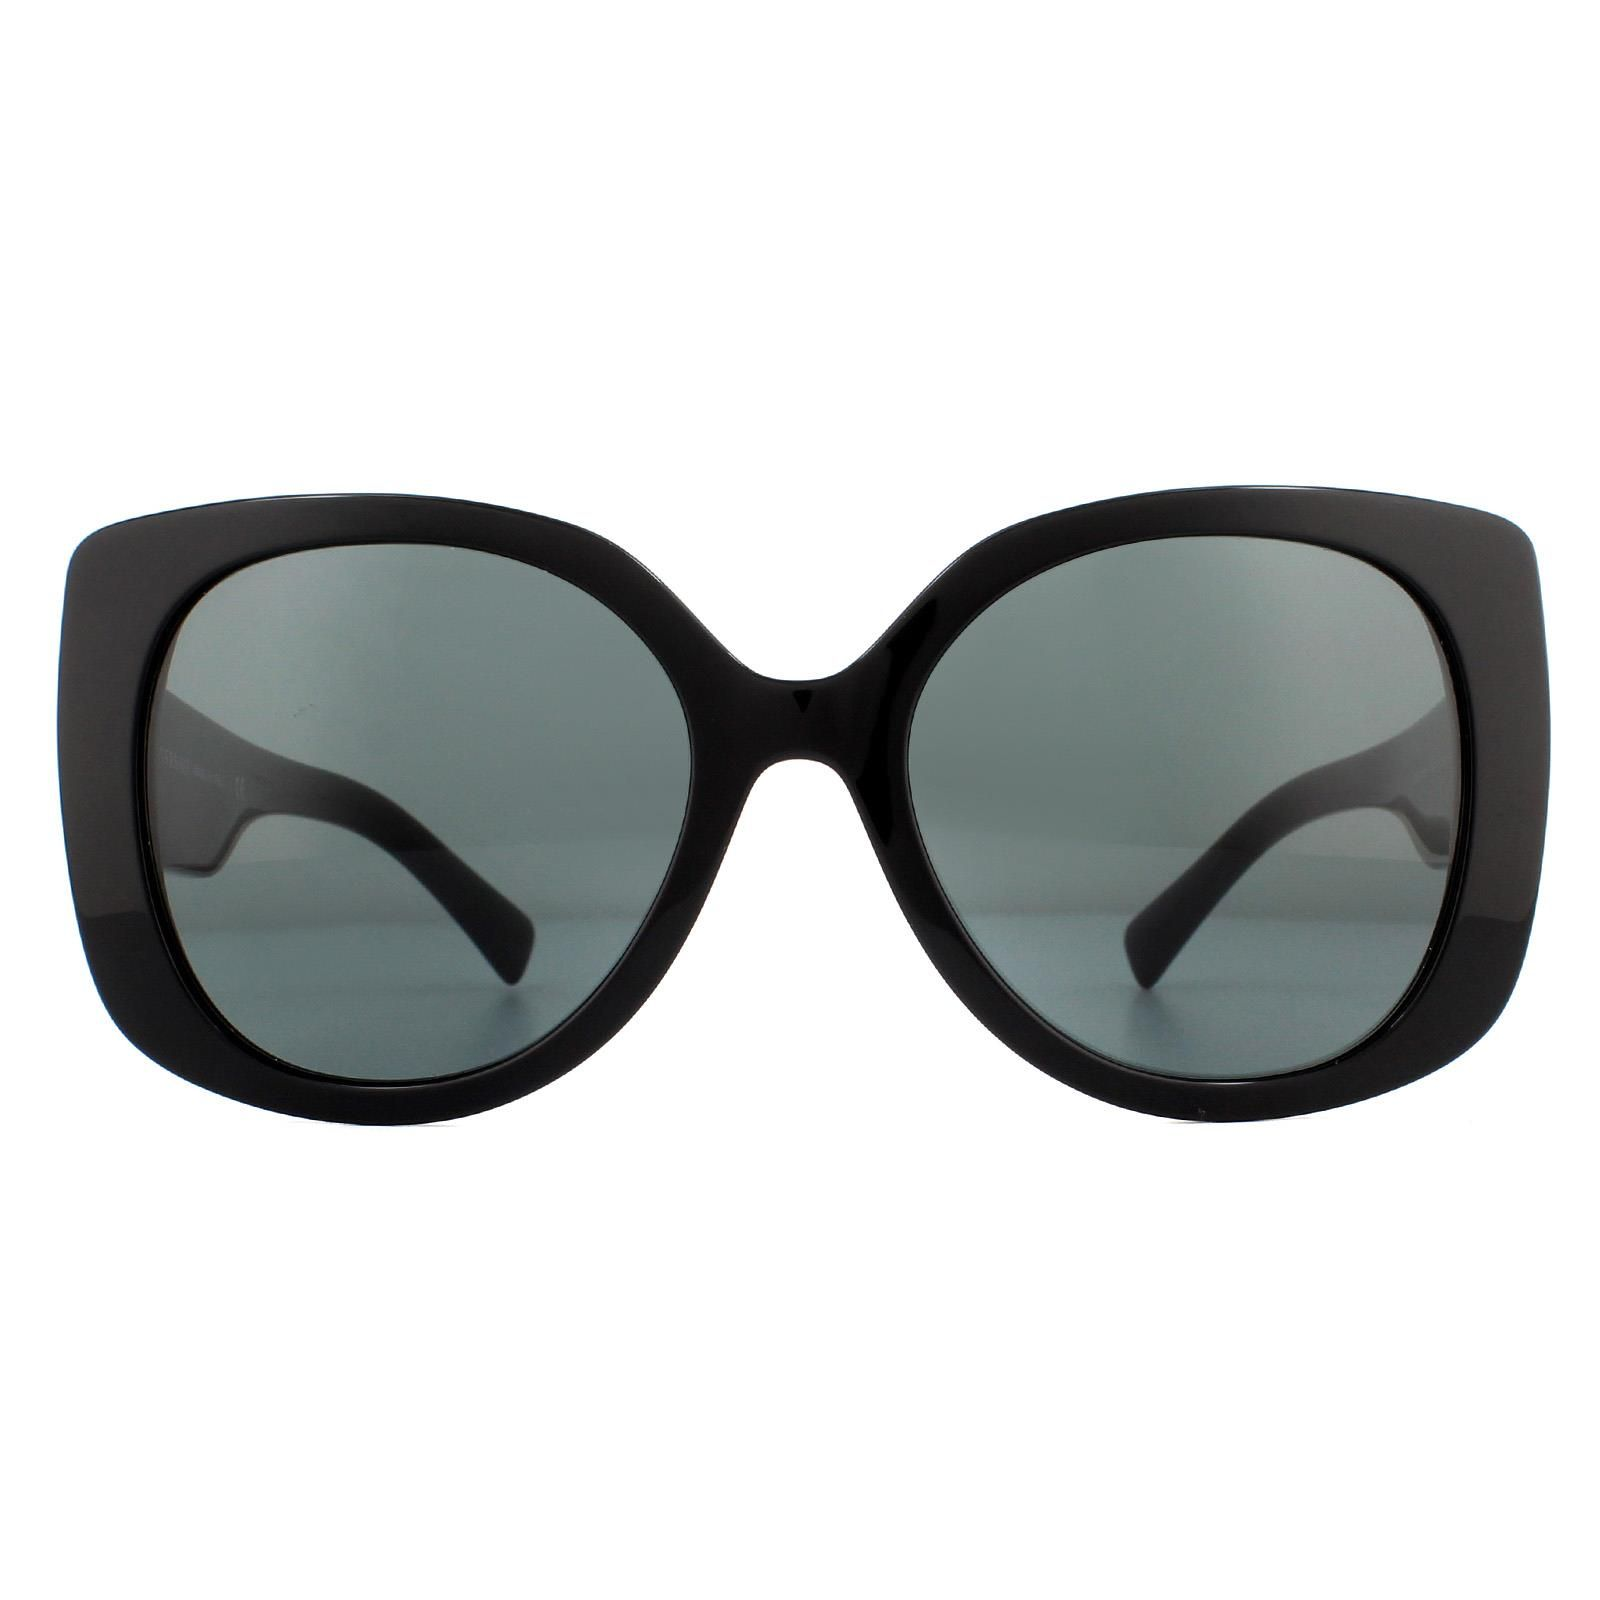 Versace Sunglasses VE4387 GB1/87 Black Dark Grey